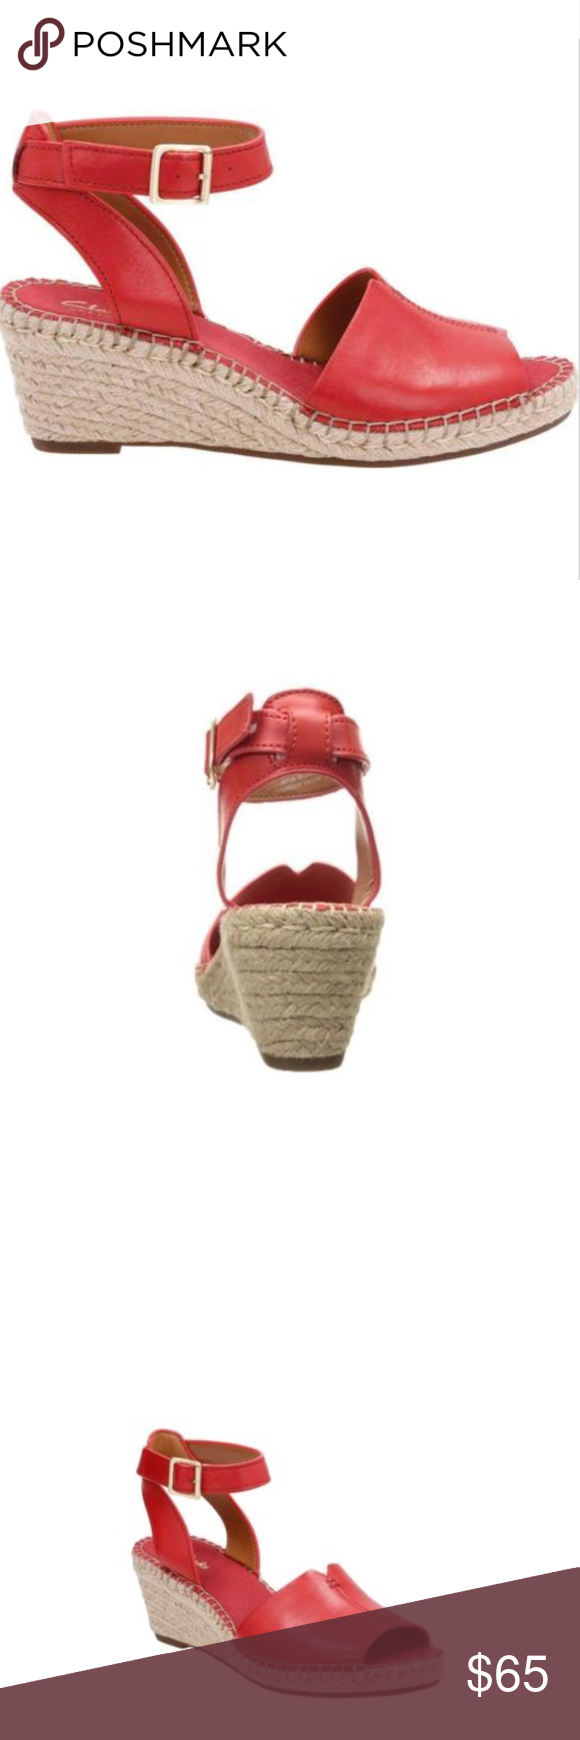 280e71fbcf3 Clarks Artisan Petrina red Espadrilles sandals 7 New without box Clarks  Artisan Womens Petrina Selma Espadrille